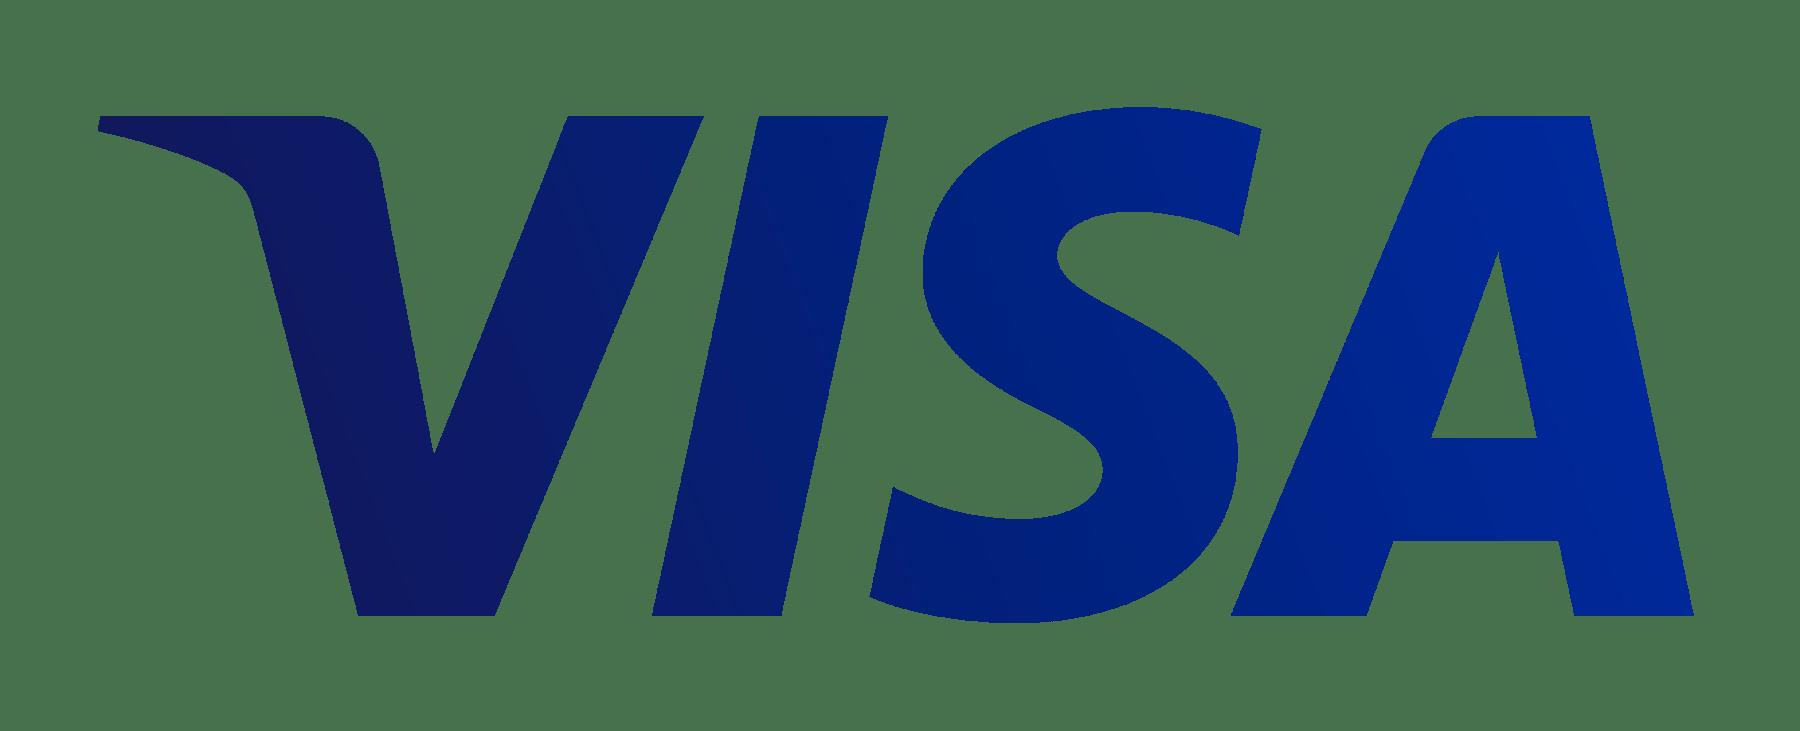 https://rocsavings.com/wp-content/uploads/2019/07/VISA-logo.png